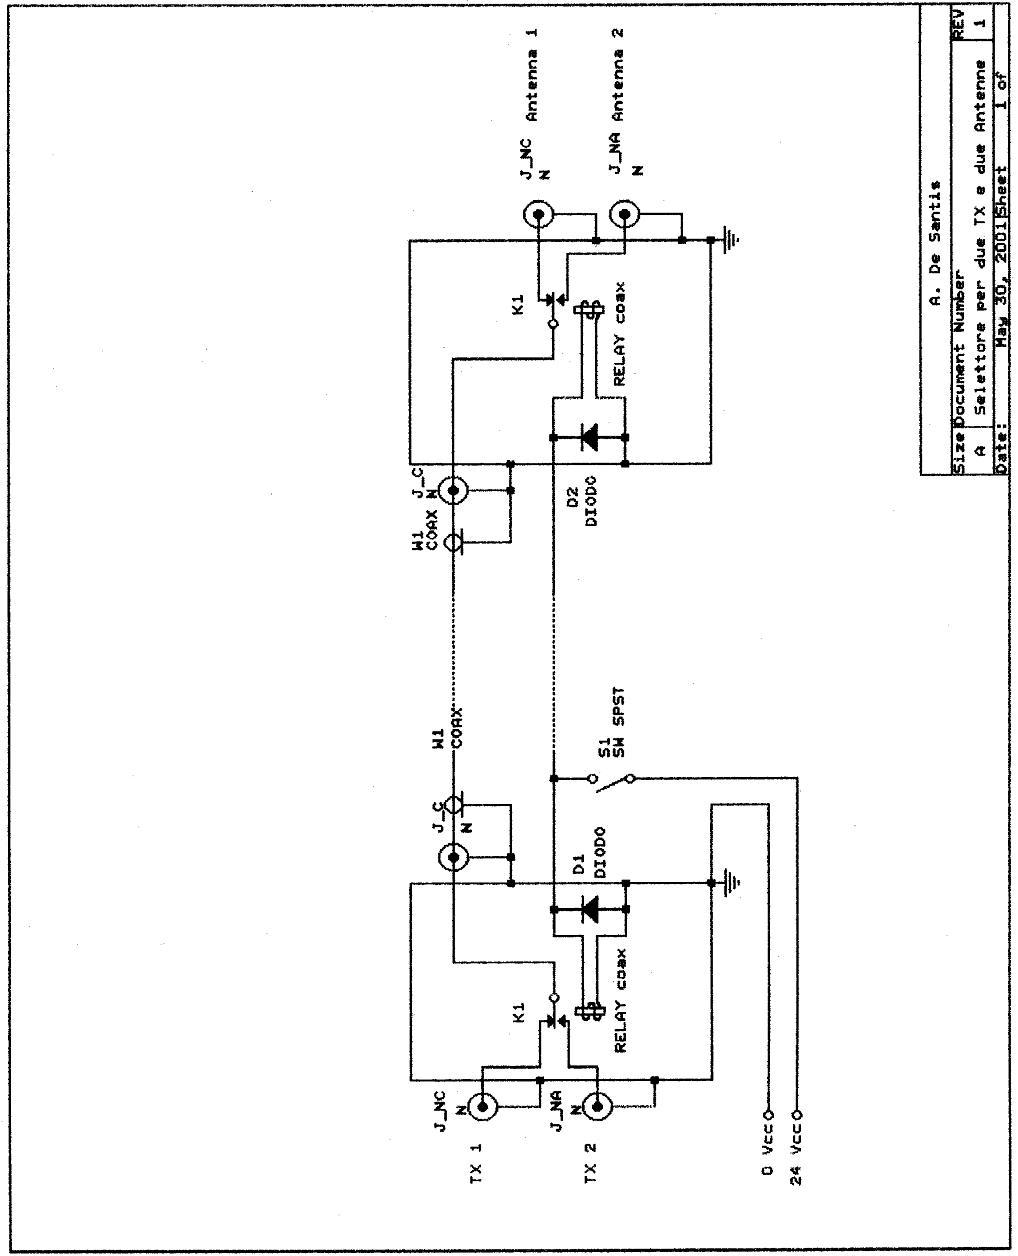 wiring diagram vespa excel wiring diagrams pictures